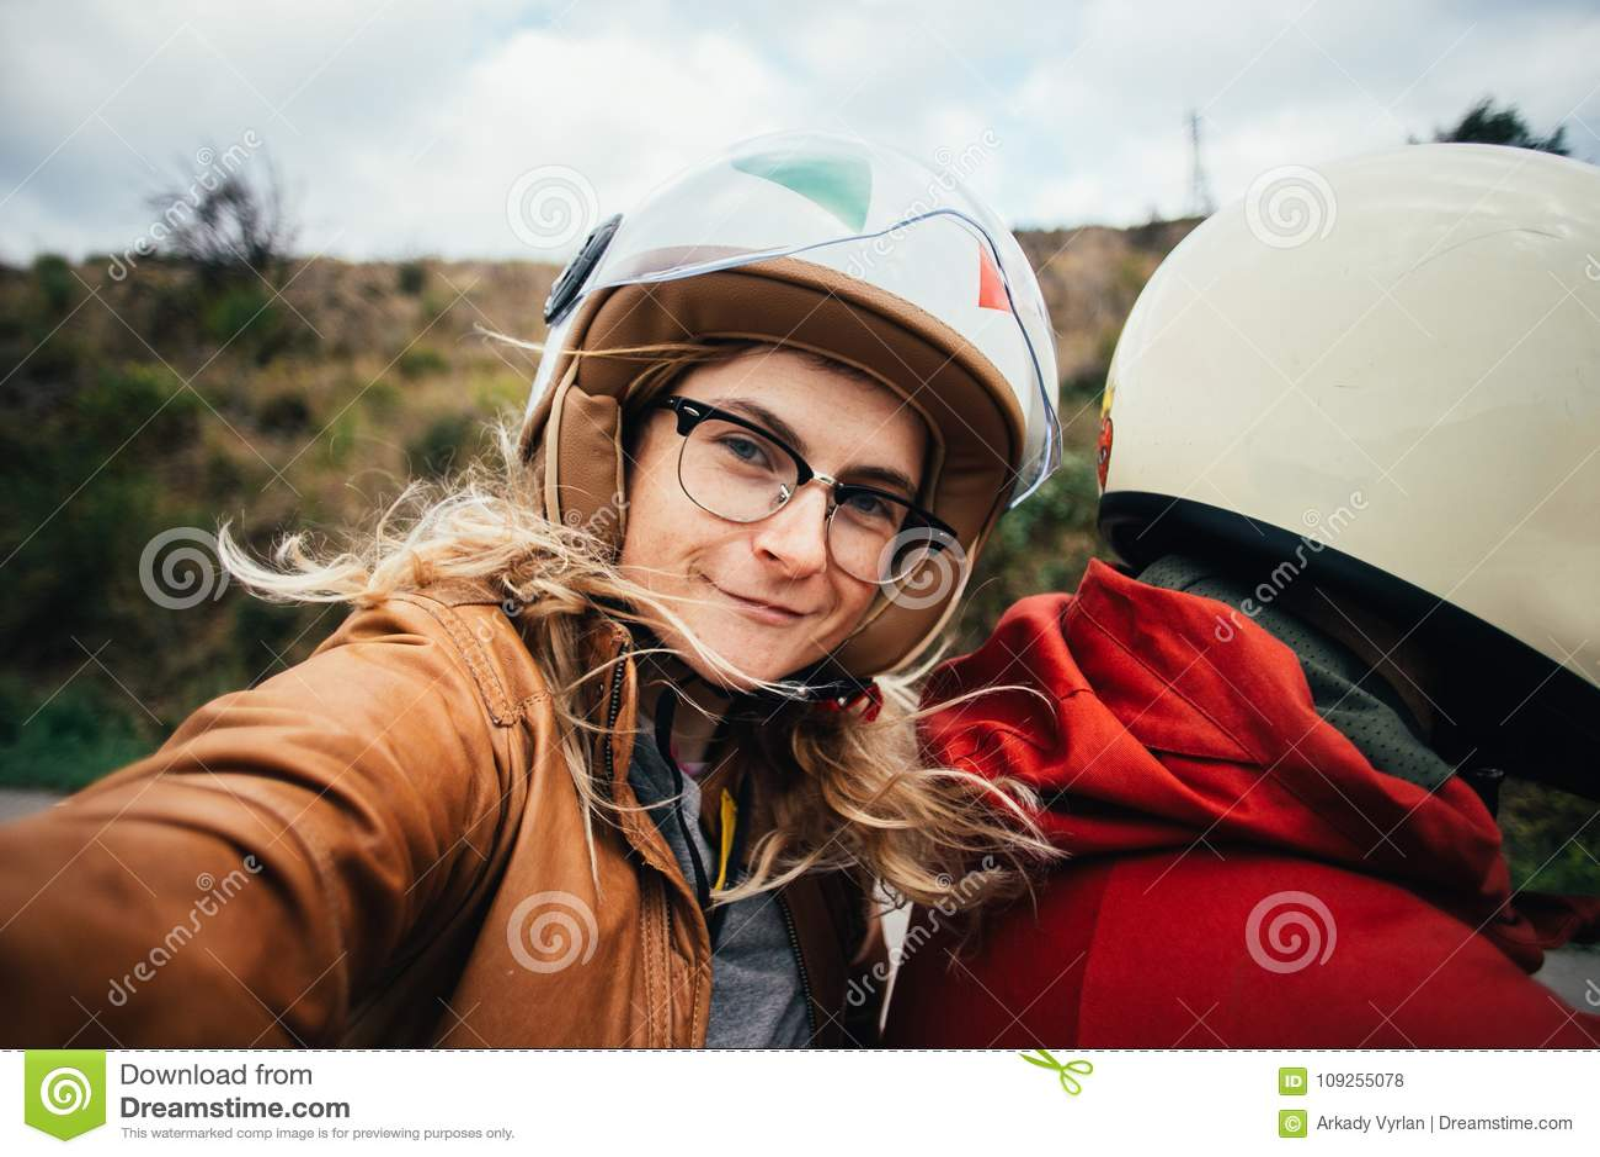 Selfie av motorcykelpassageraren, ung kvinna